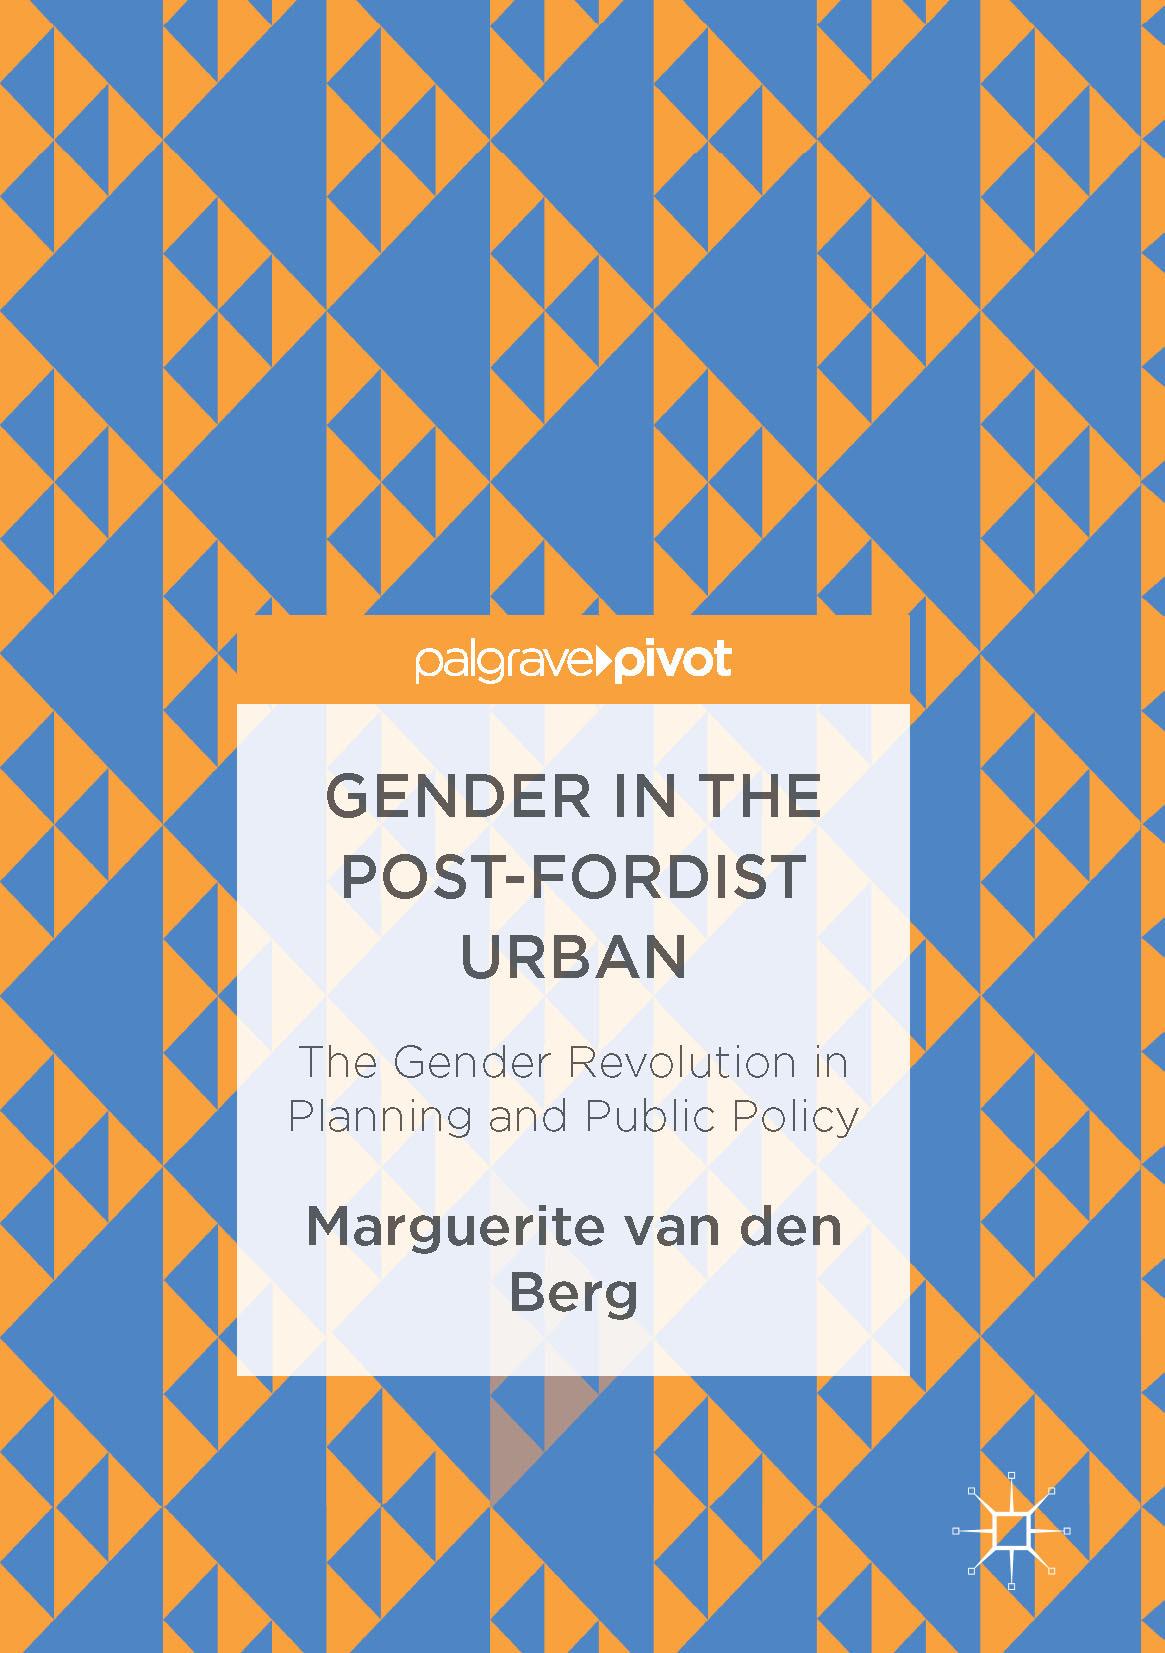 Berg, Marguerite van den - Gender in the Post-Fordist Urban, ebook